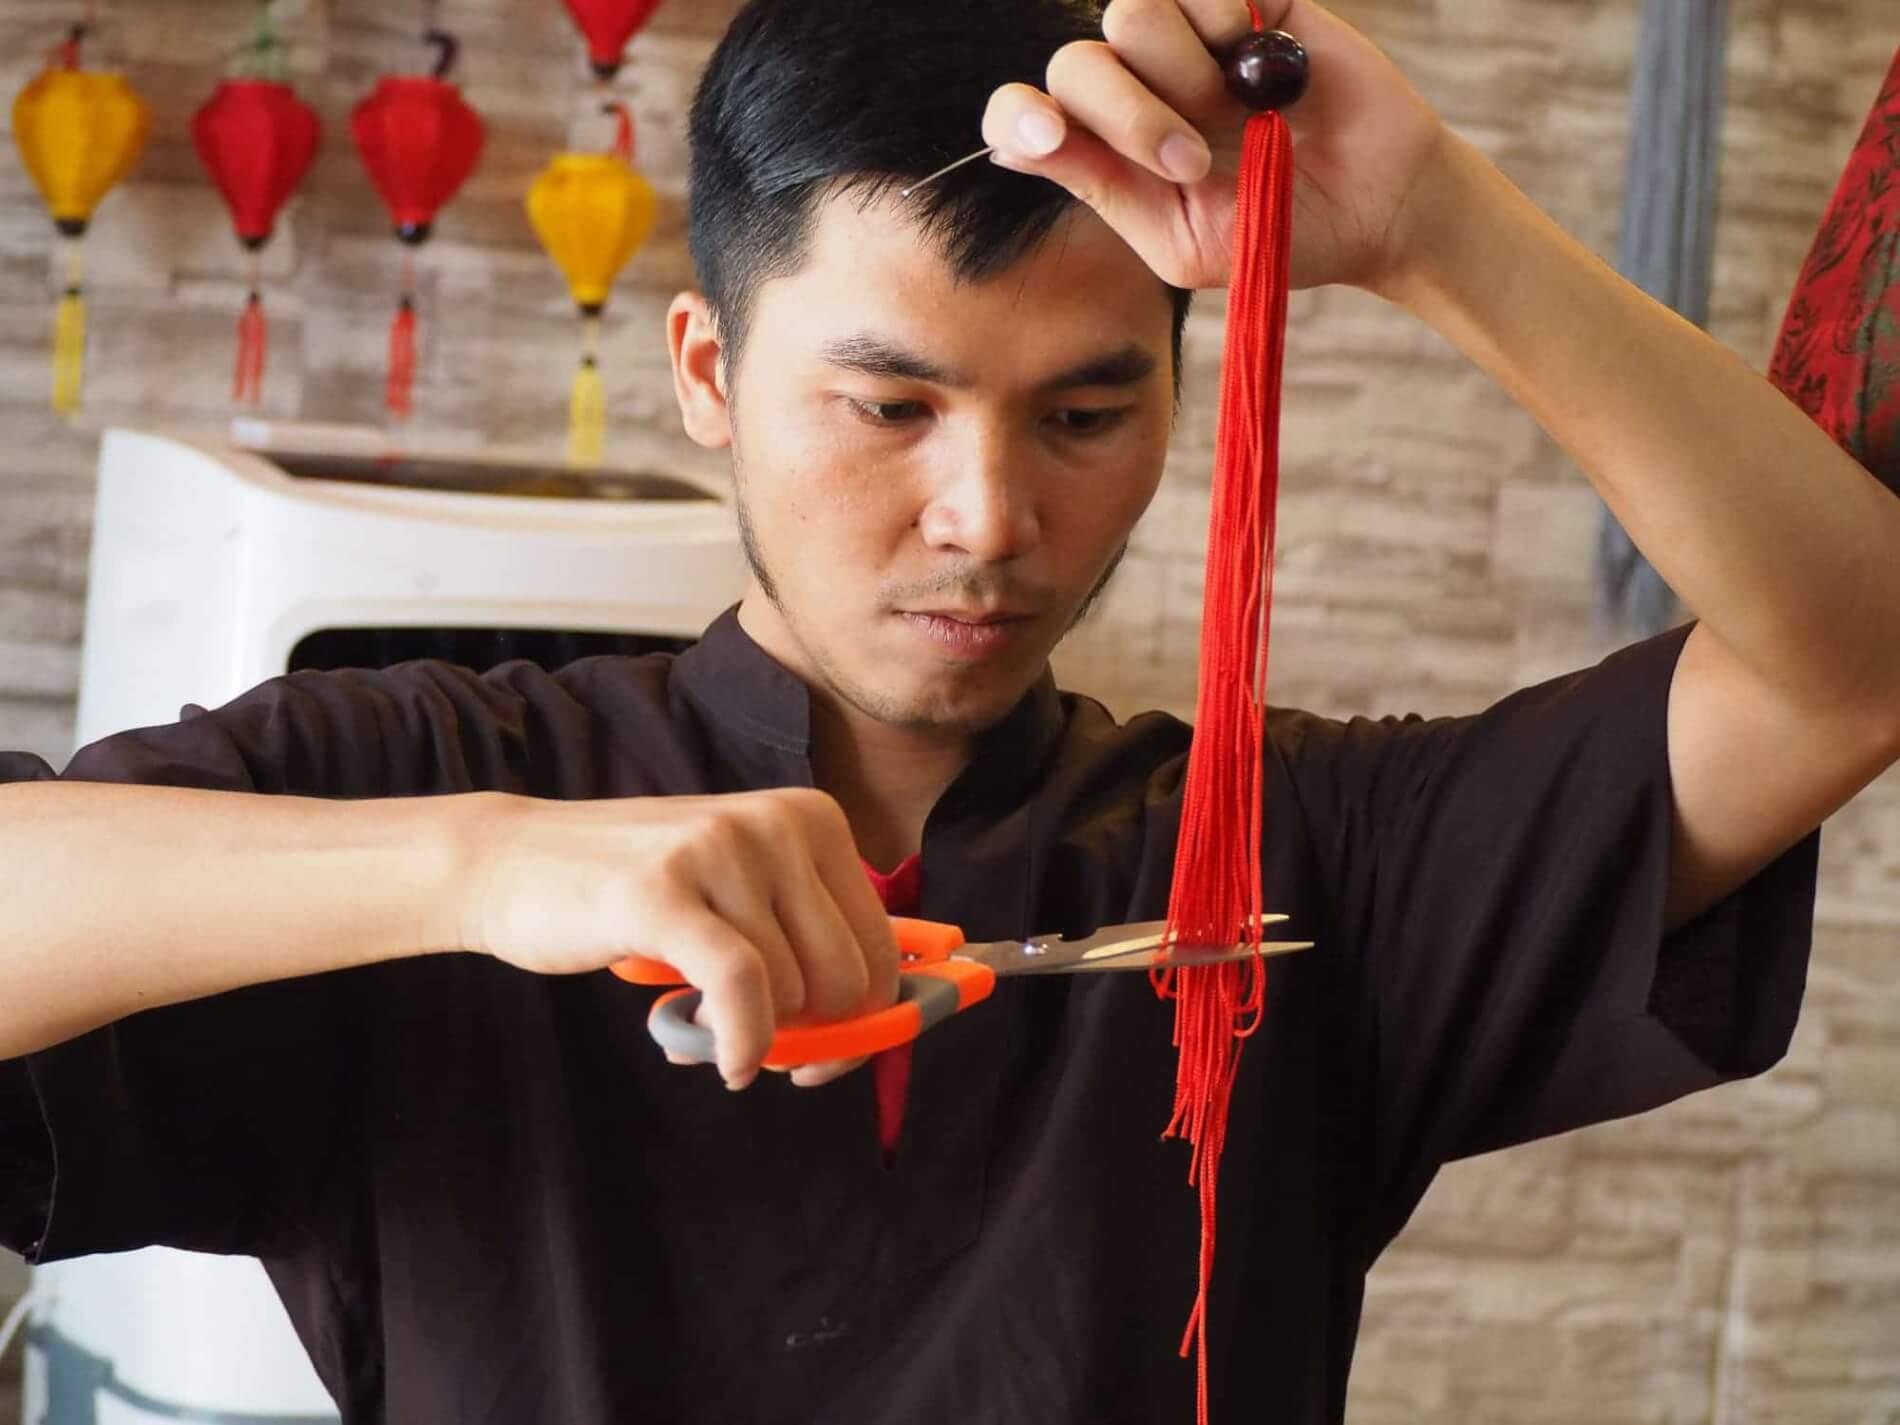 Hoi An Handicraft Tours - lantern making - cutting the strings